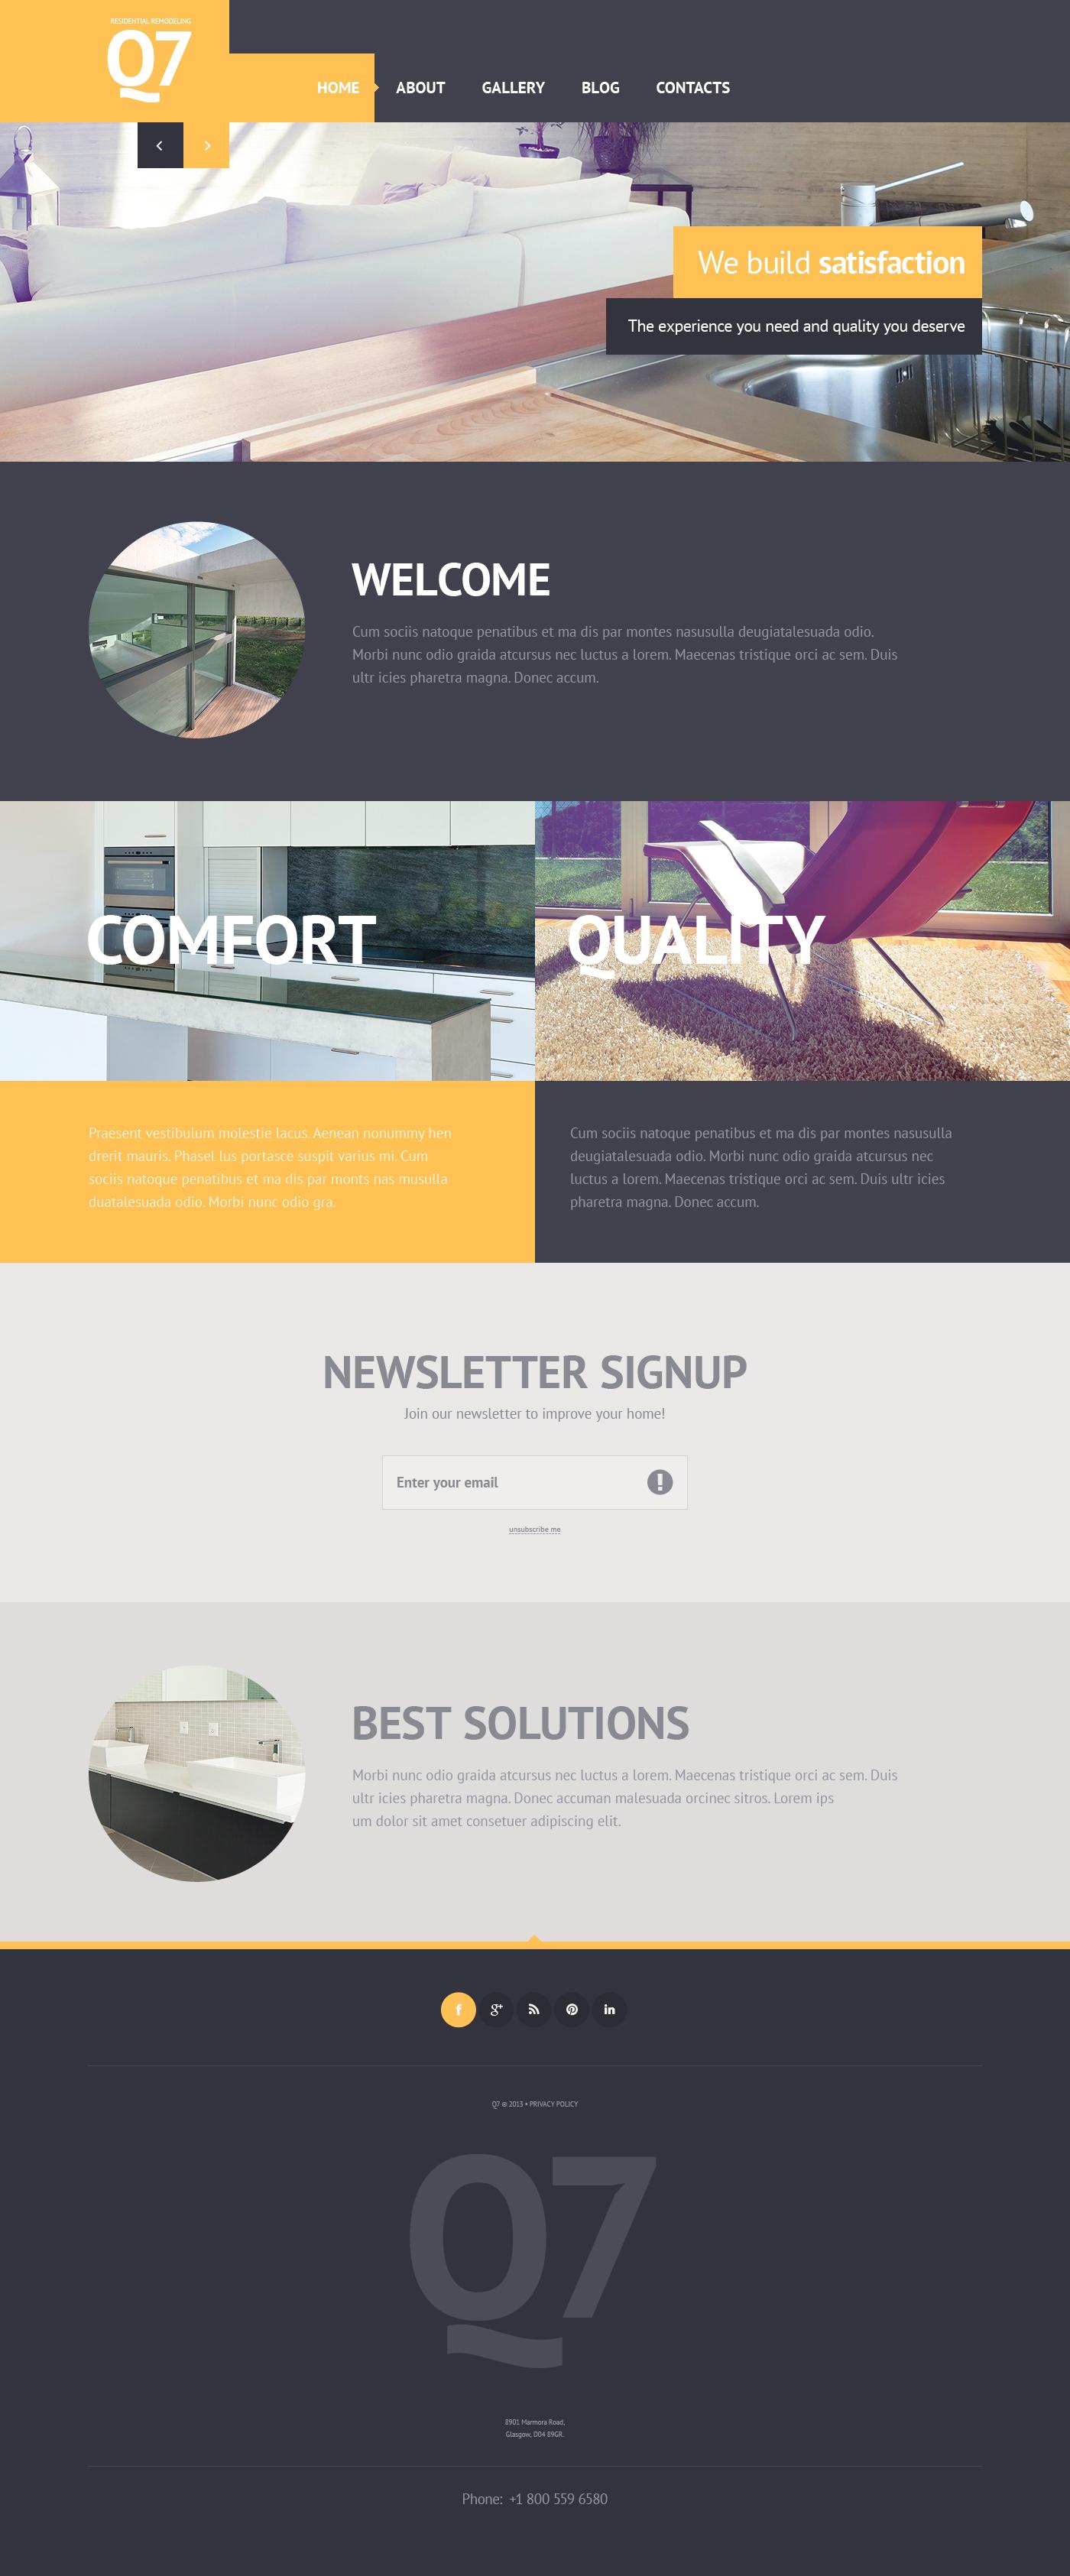 Plantilla Web Responsive para Sitio de Diseño interior #46032 - captura de pantalla